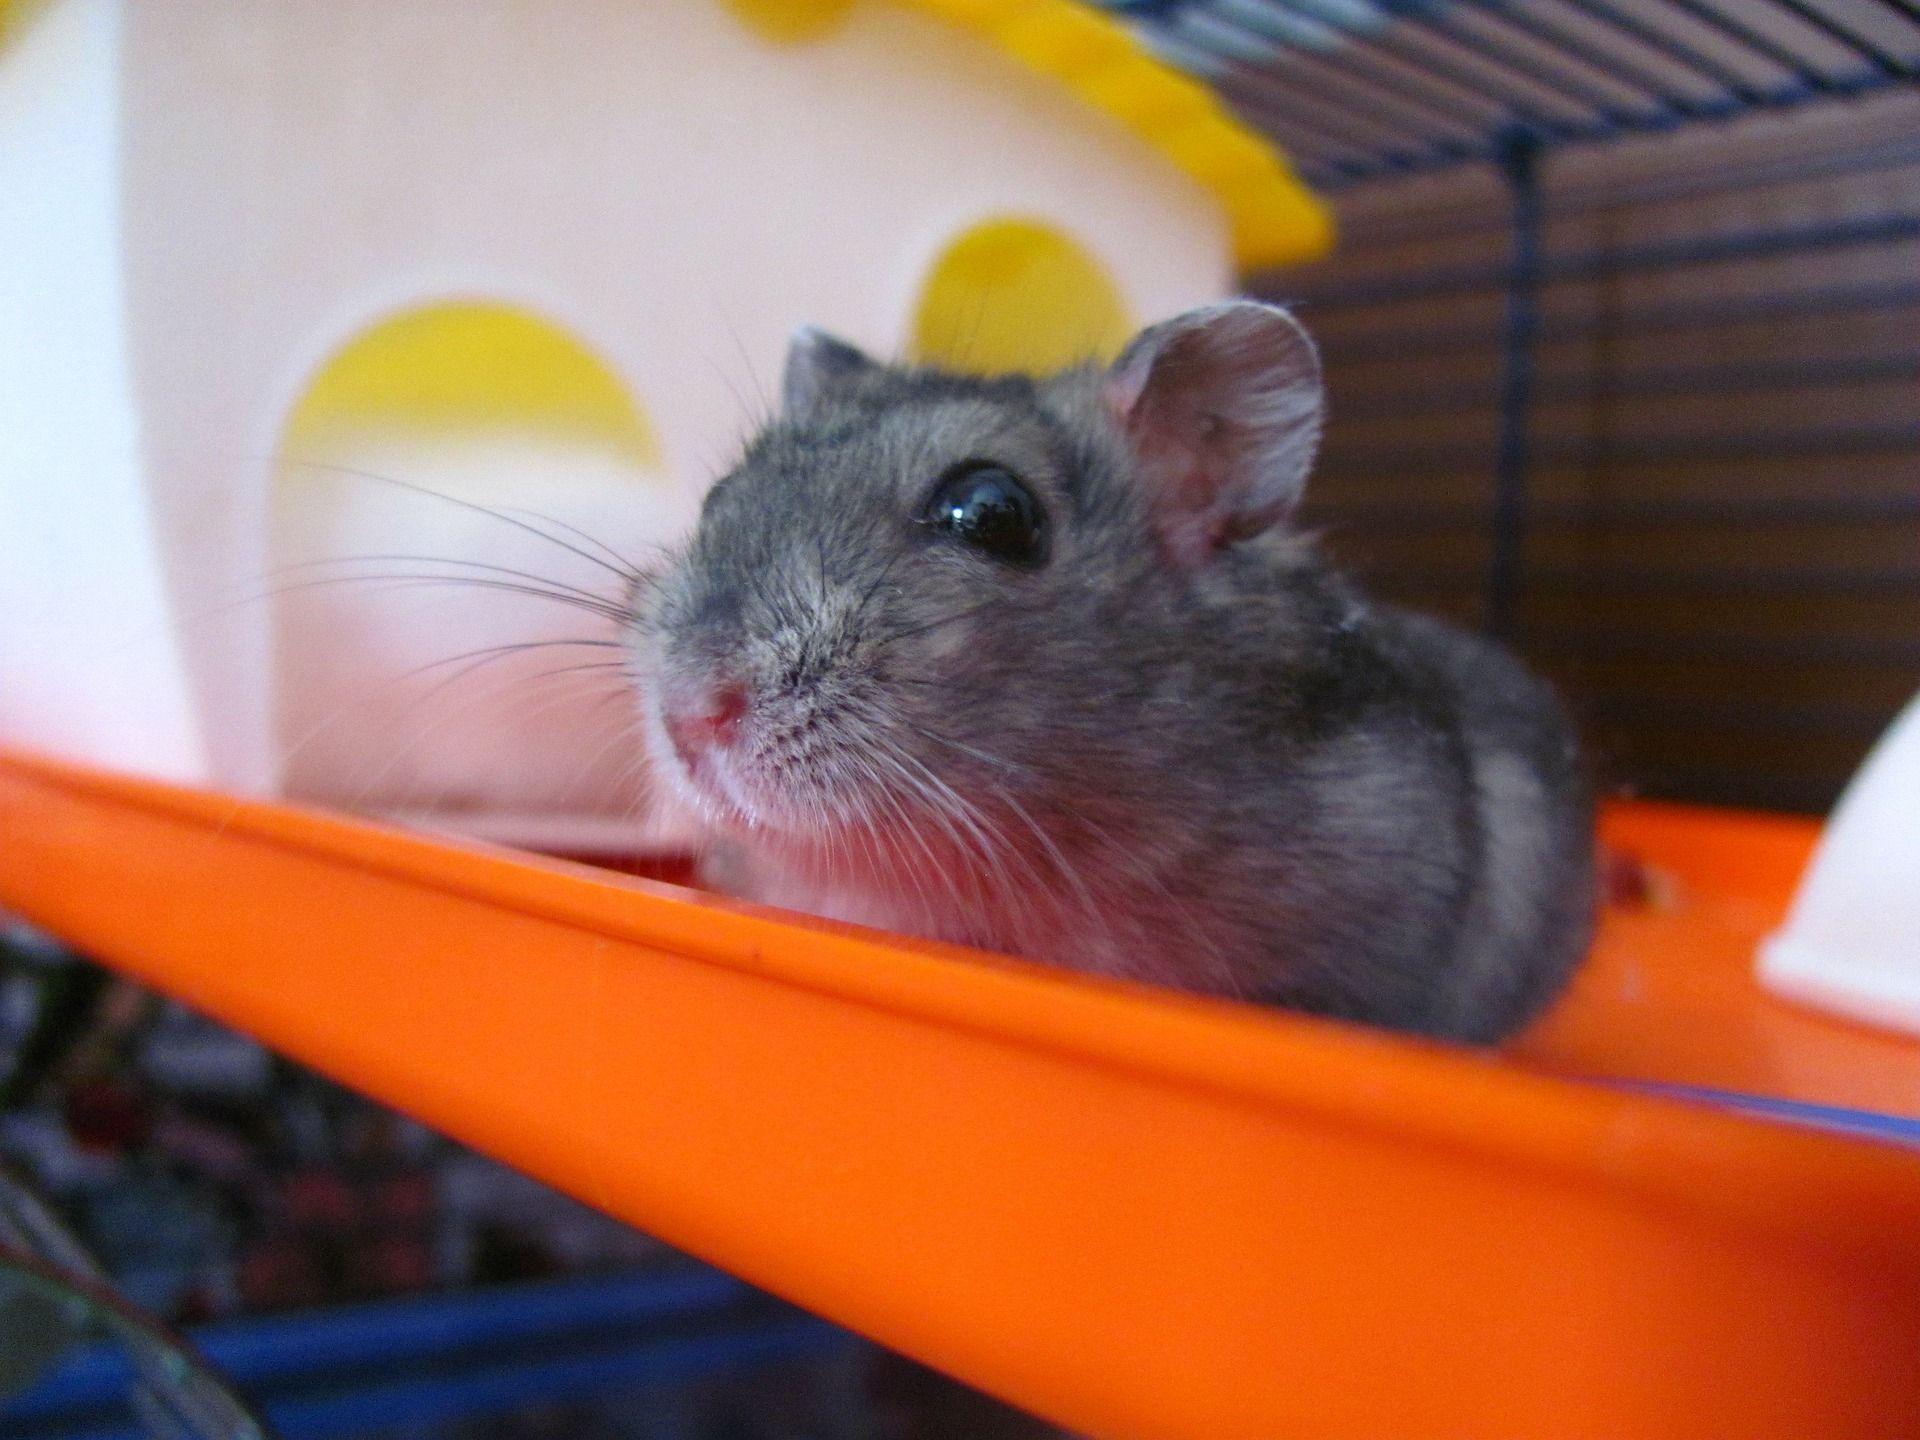 Accesorios para roedores: Servicios de Animals Land